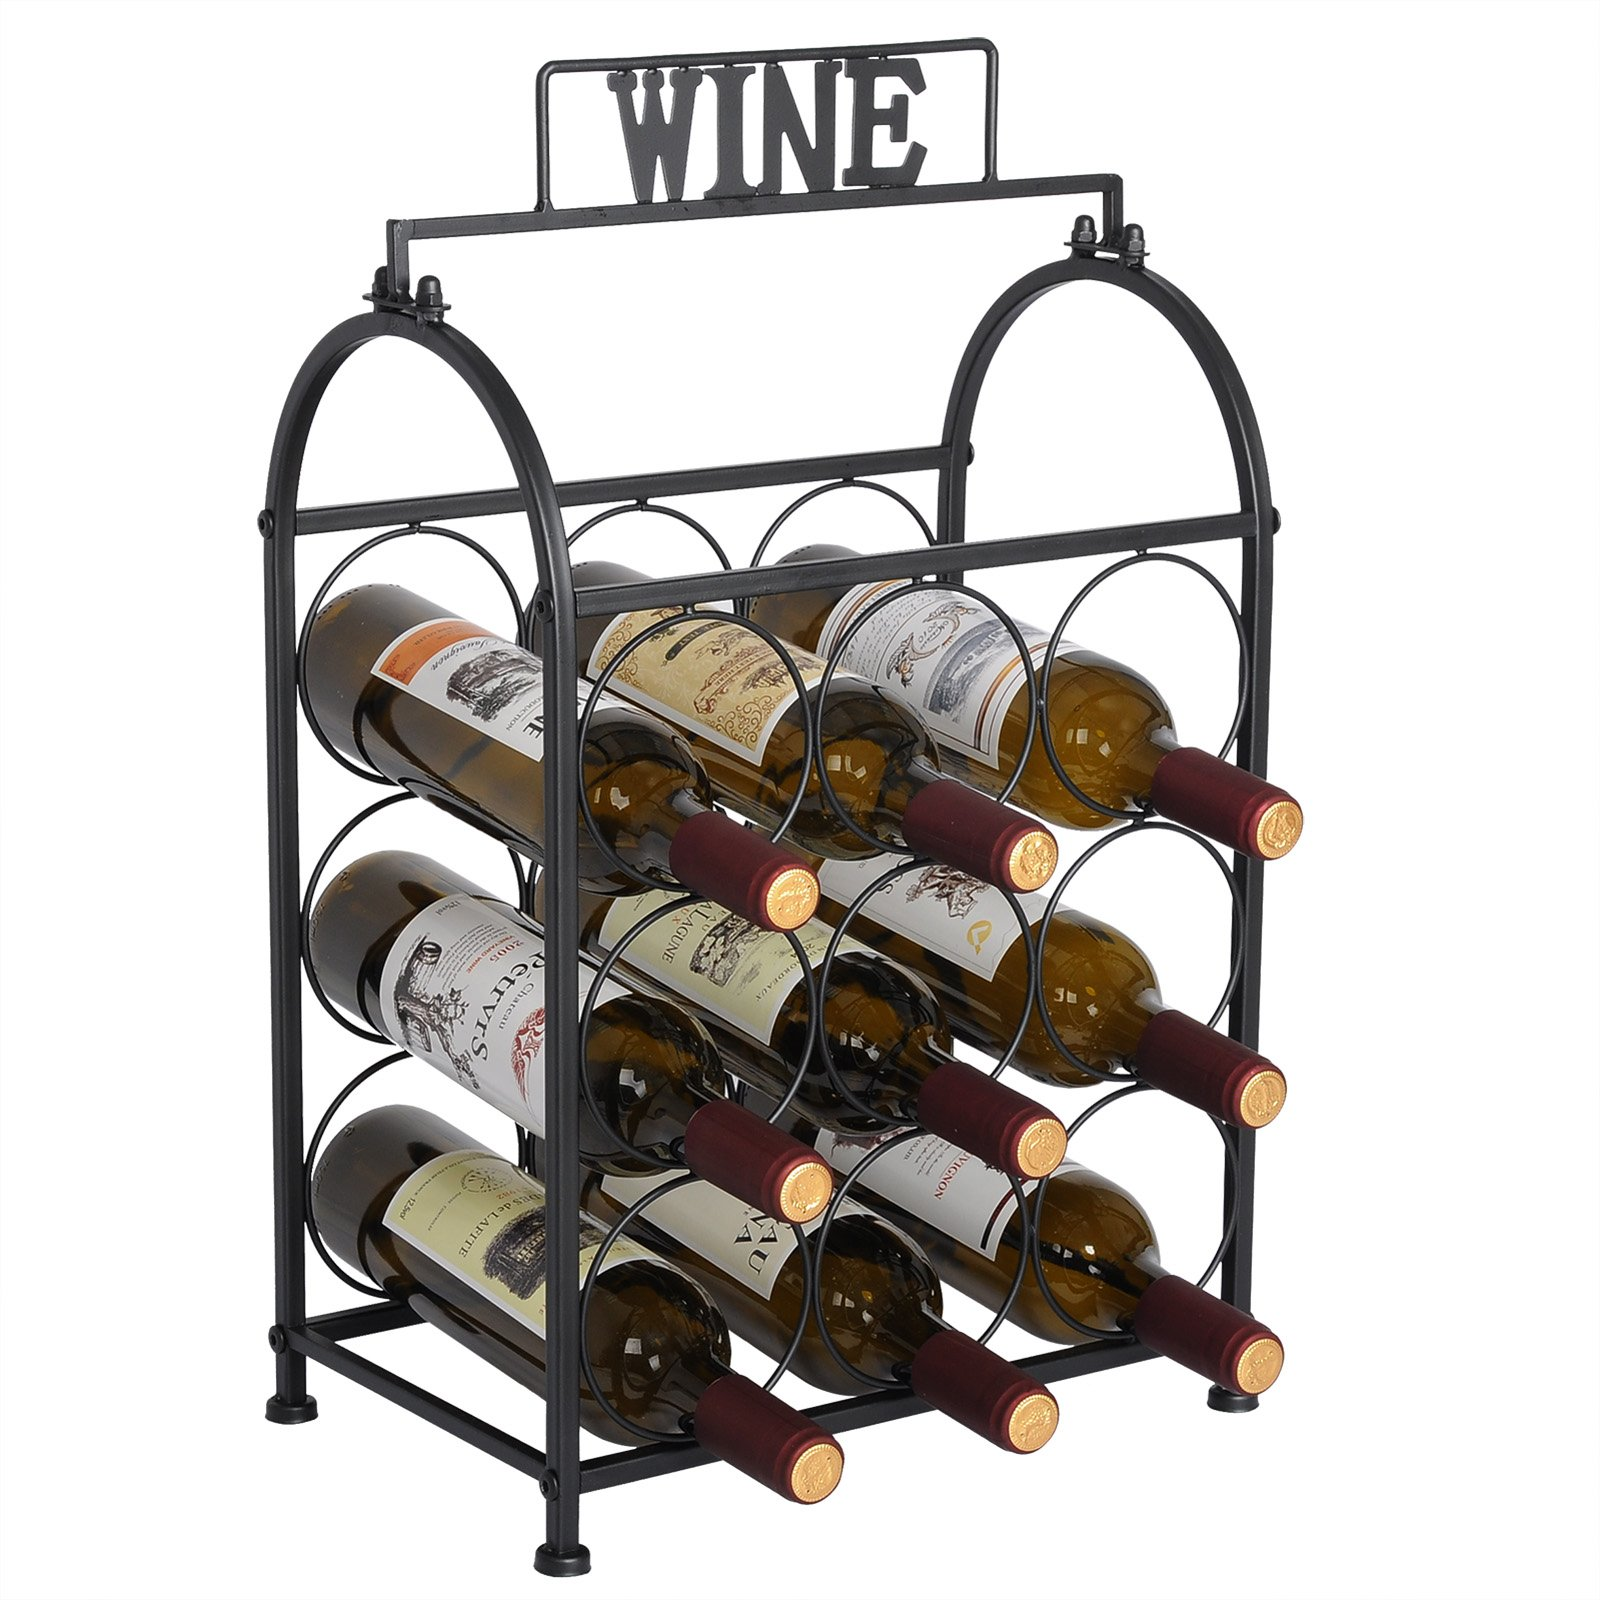 WOLTU Metal Wine Rack Wine Holder for 9 Bottles Storage Display Stand, Black, 22'' High, KIA08blk